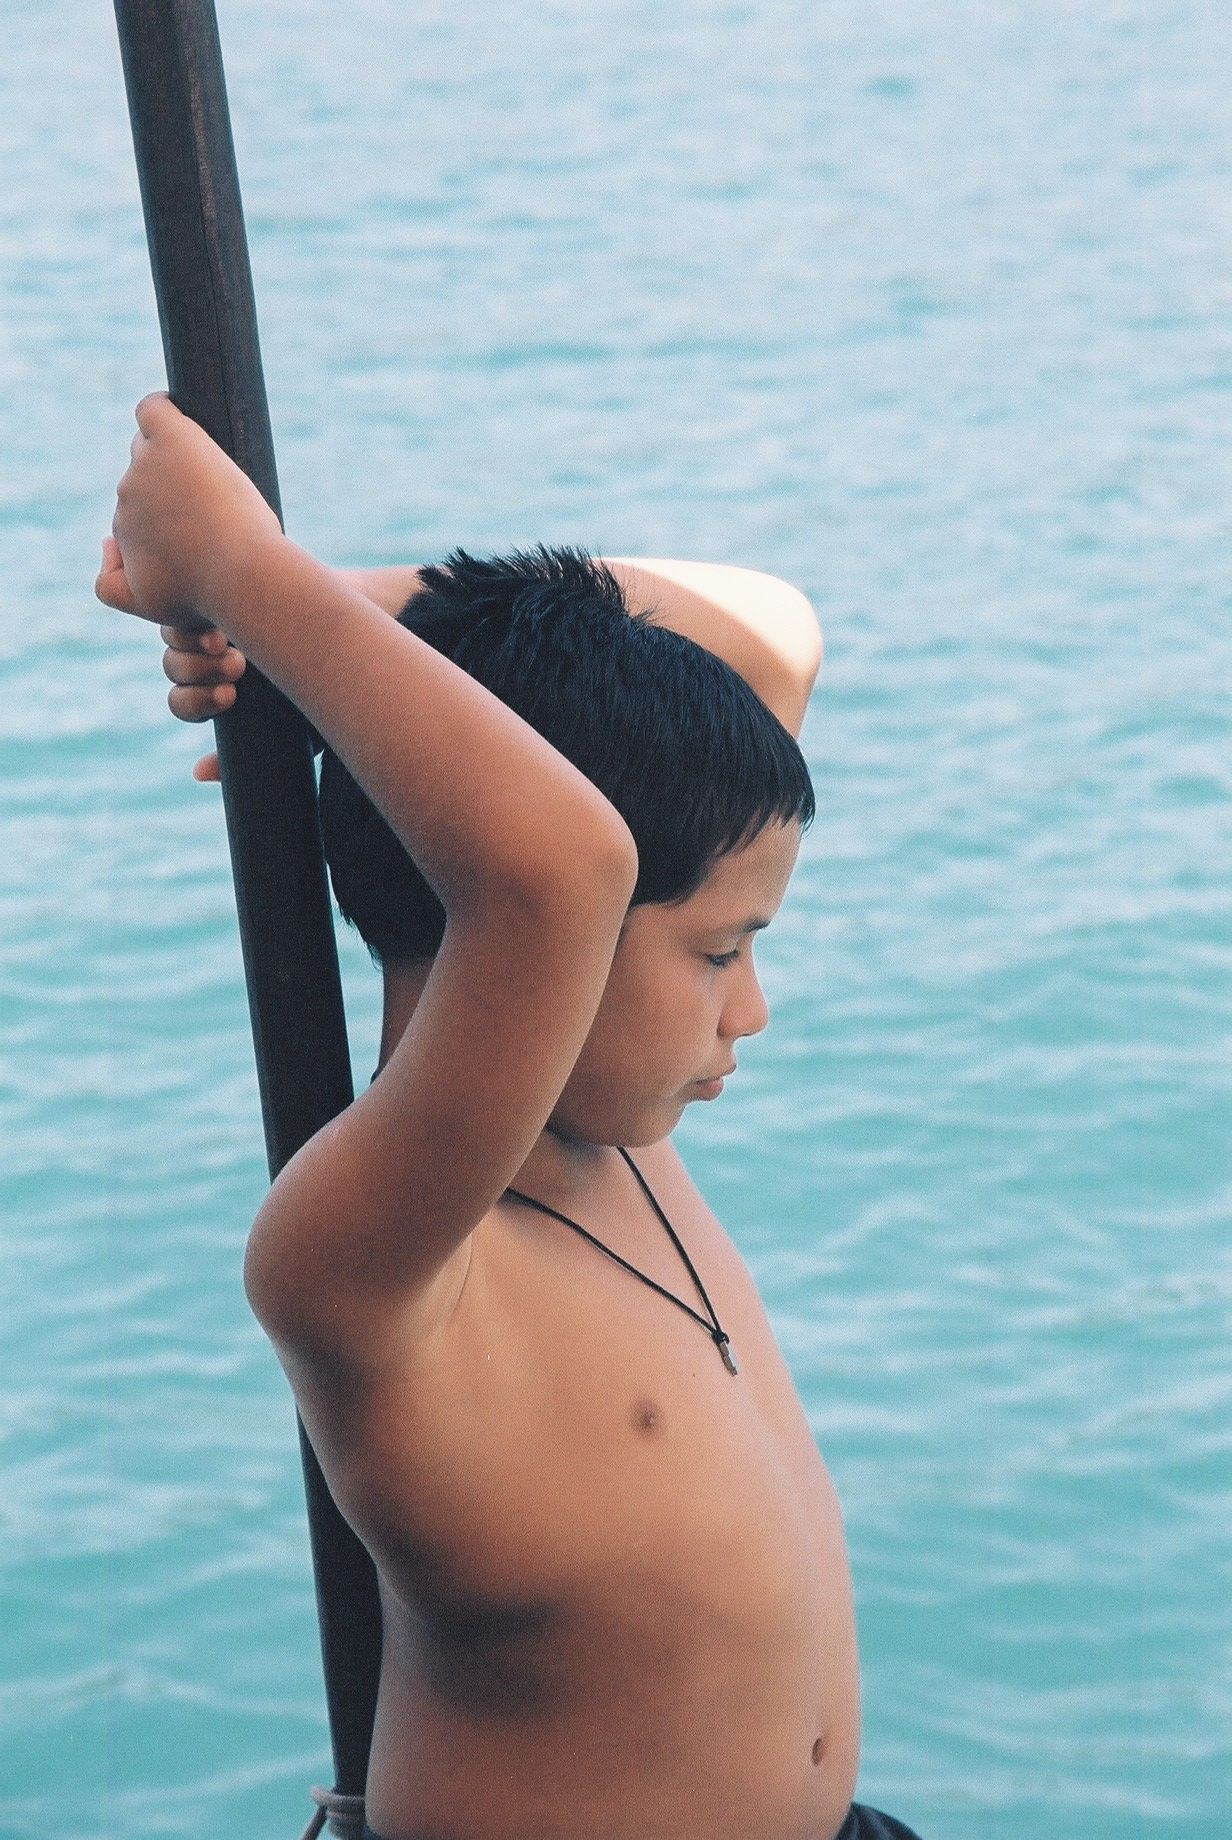 Boy on Boat, Parati.JPG